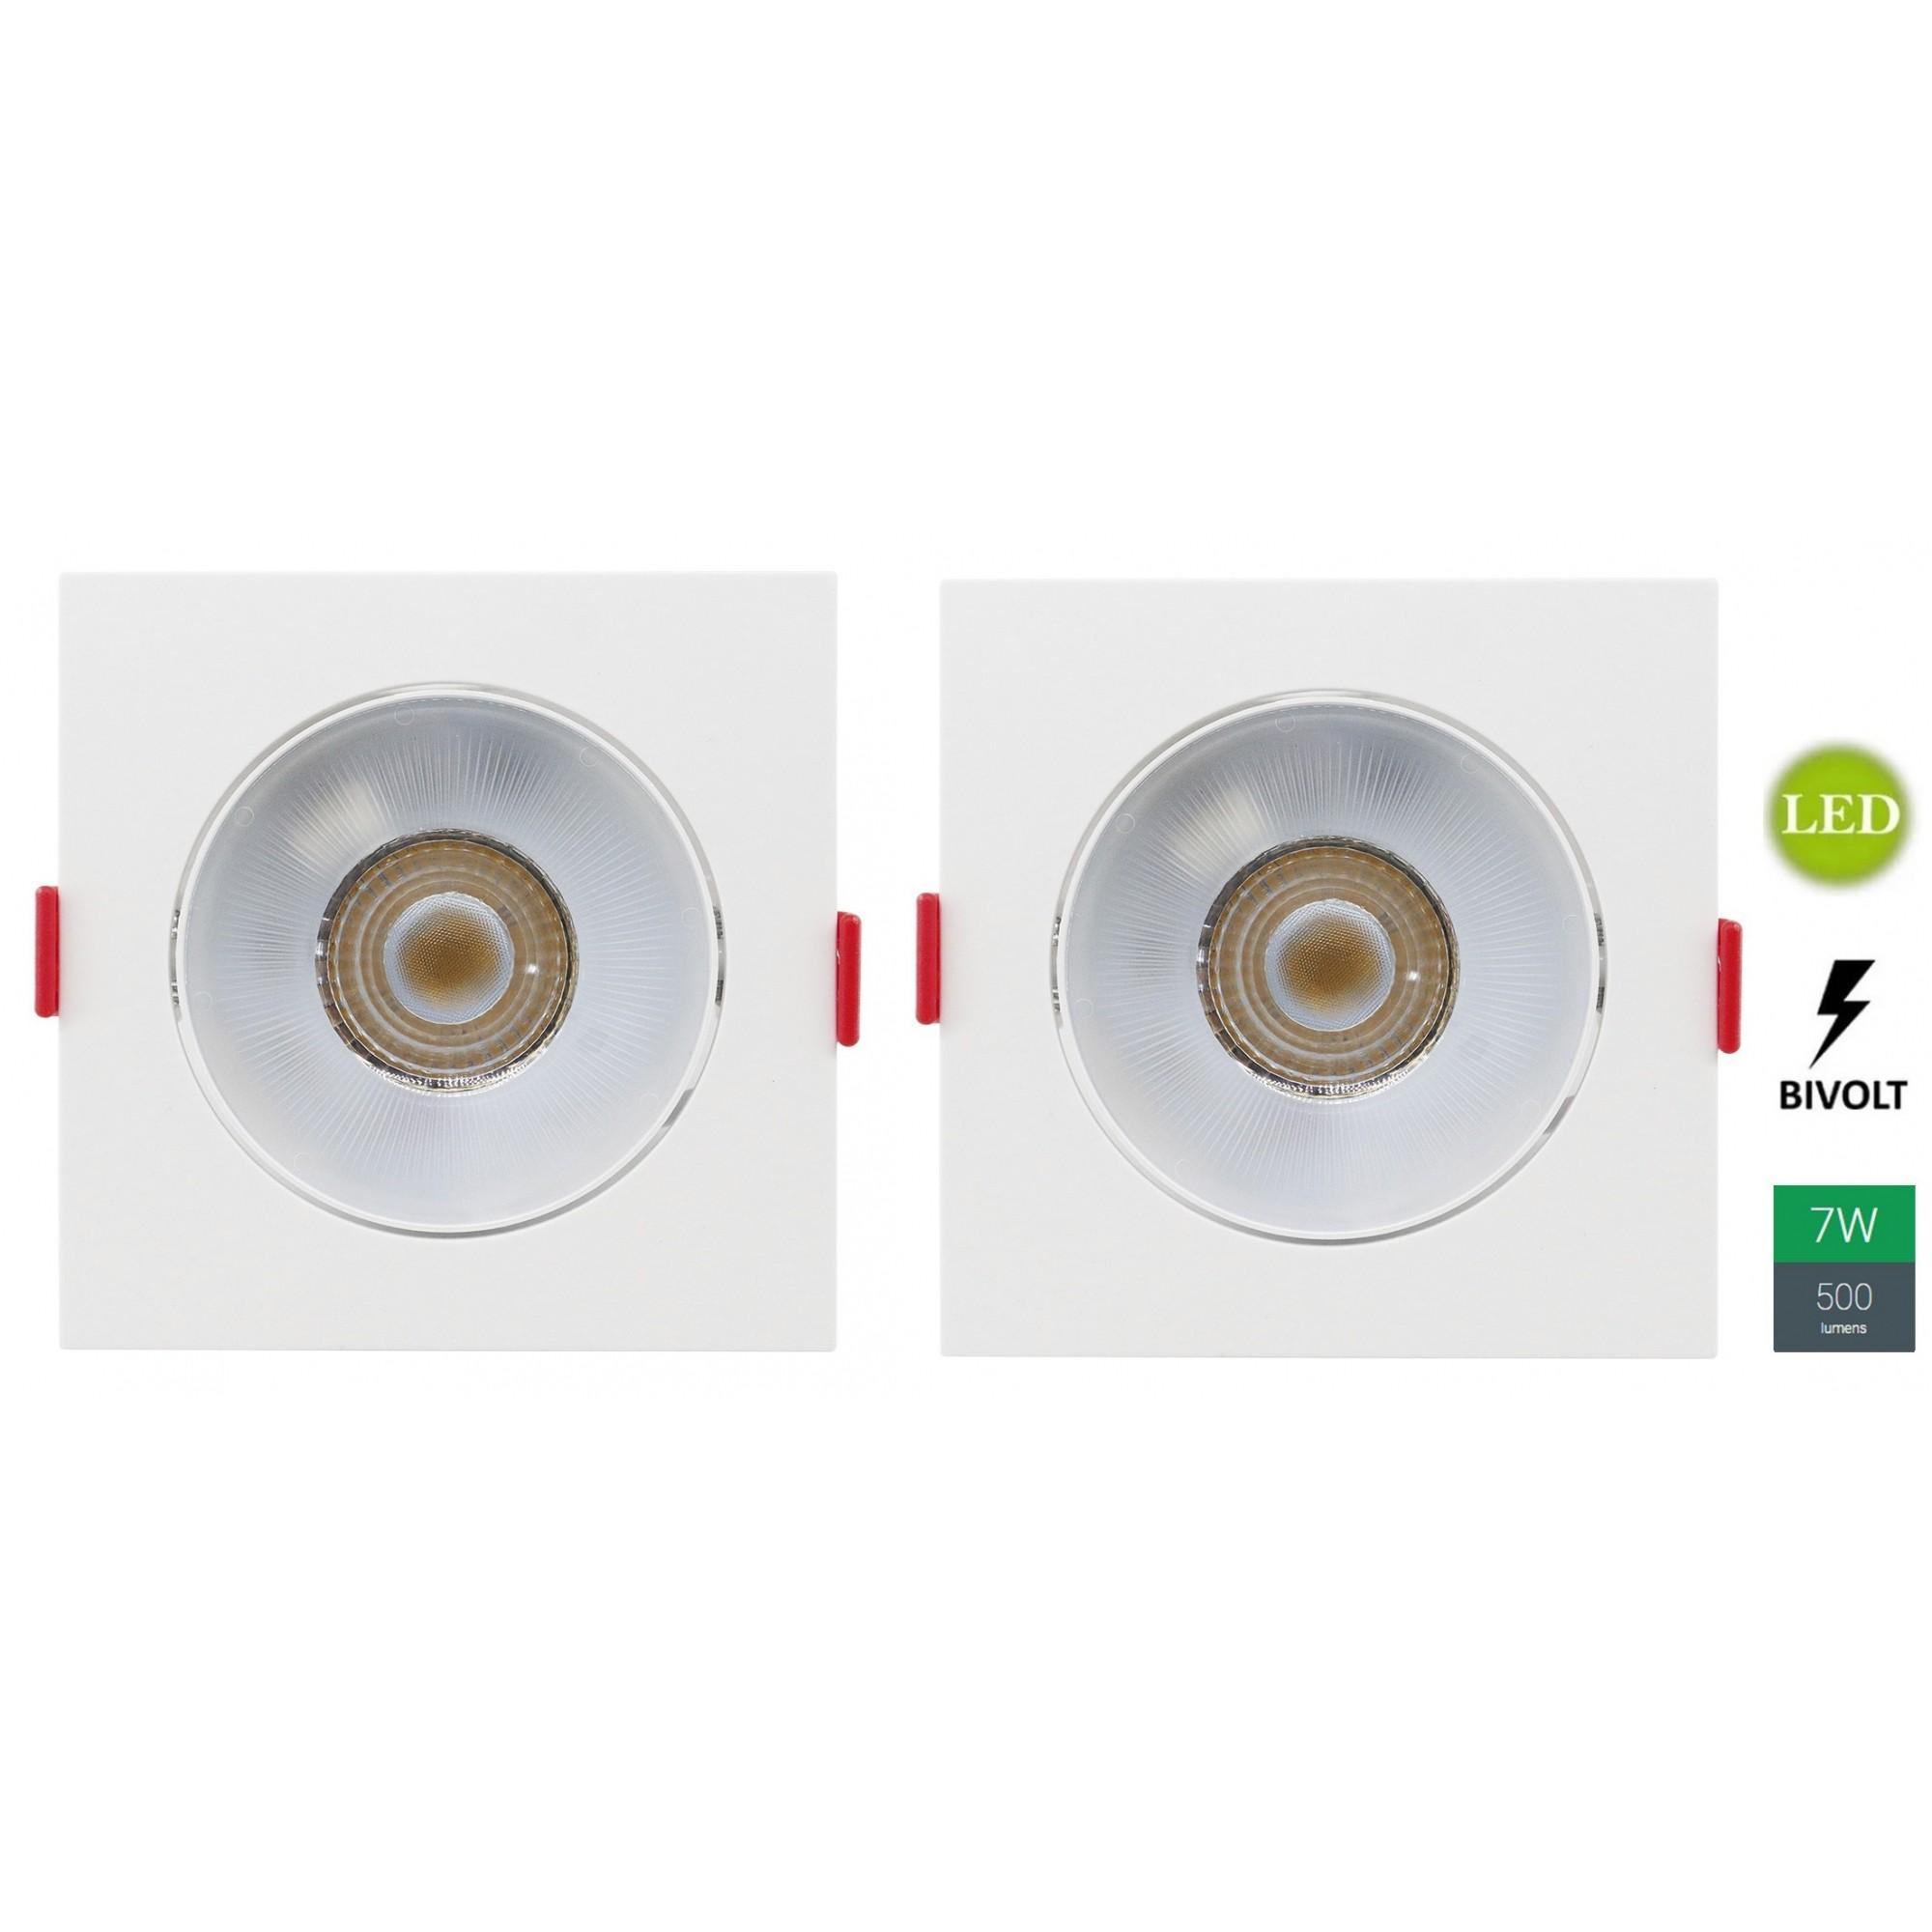 Kit 2 Spots Embutir 7w Quadrado Branco Quente